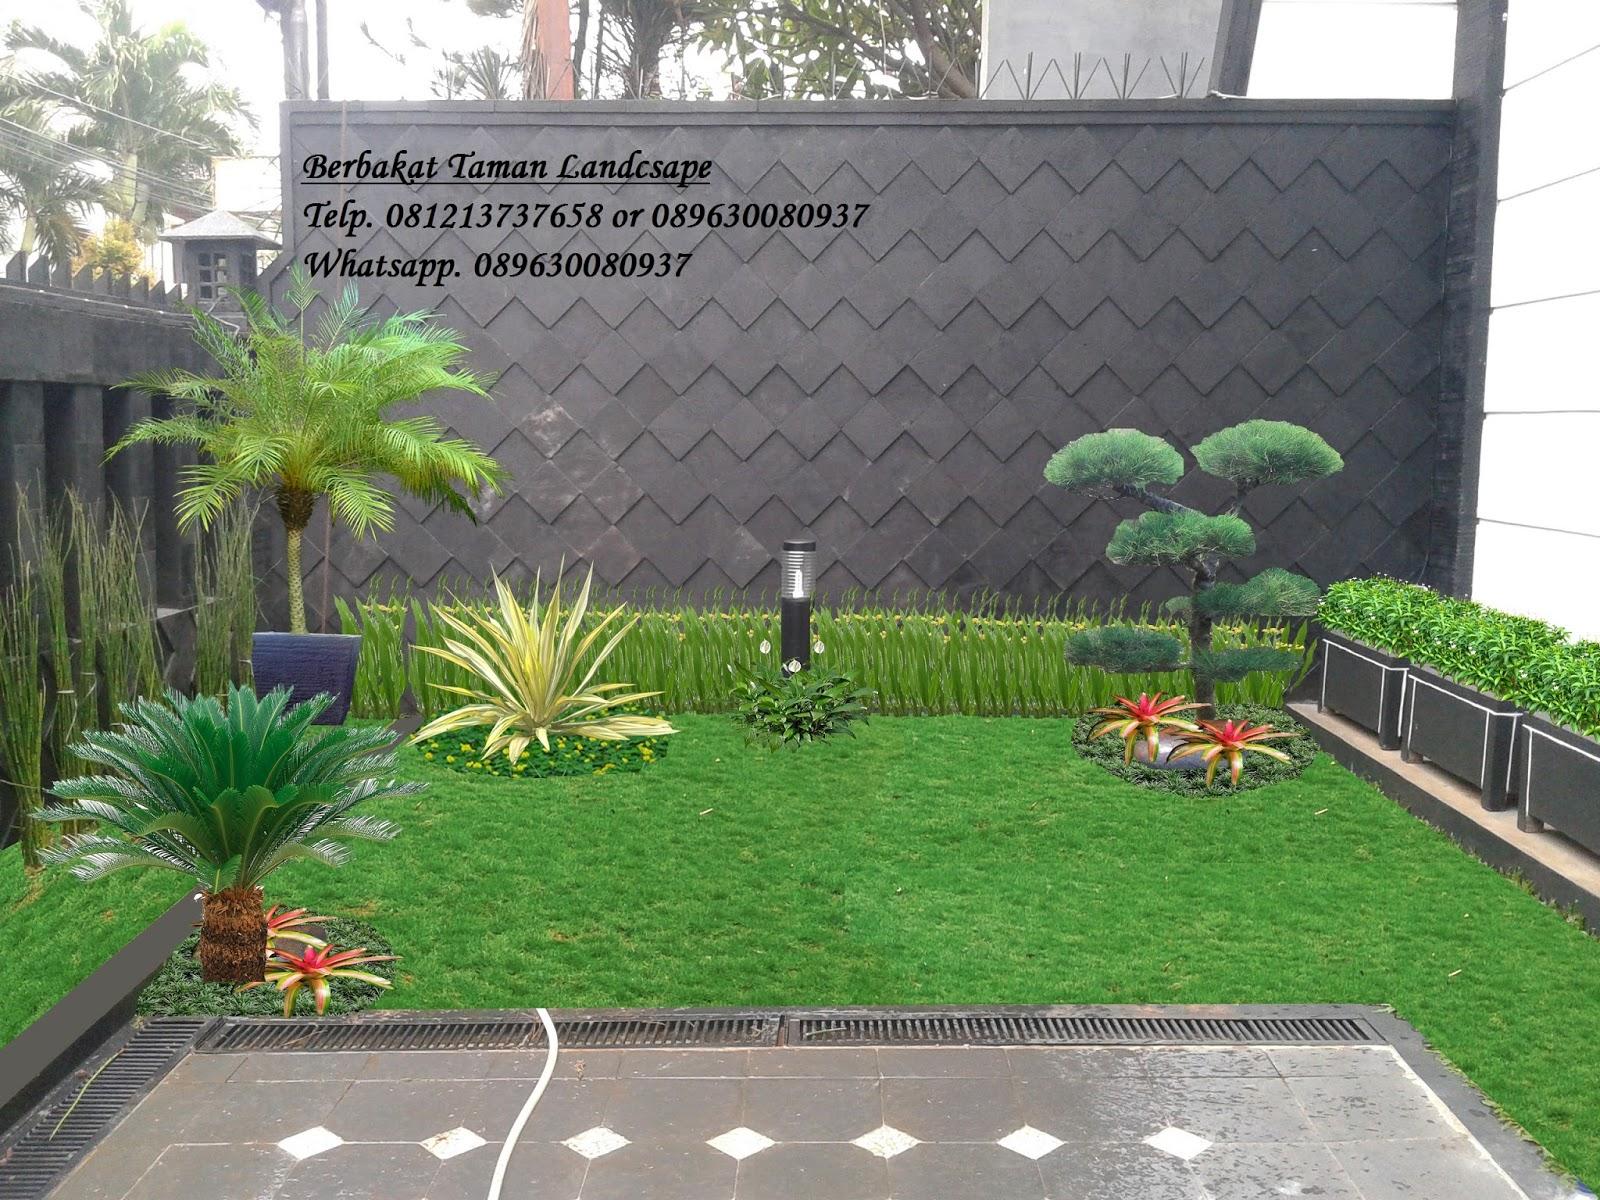 Pasang Taman Dan Saung Gazebo Kayu Kelapa Gazebo Bambu Gazebo